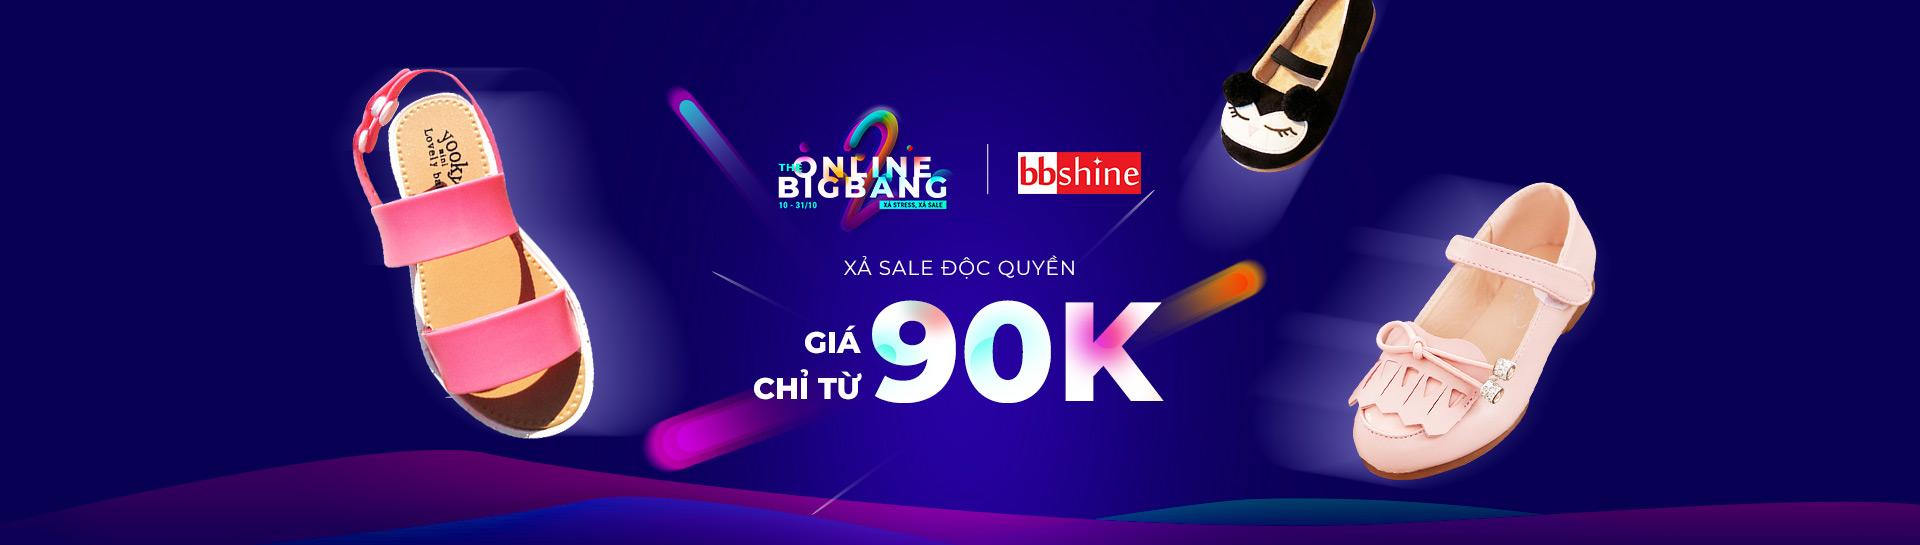 BBShine - Giá chỉ từ 99k + freegift